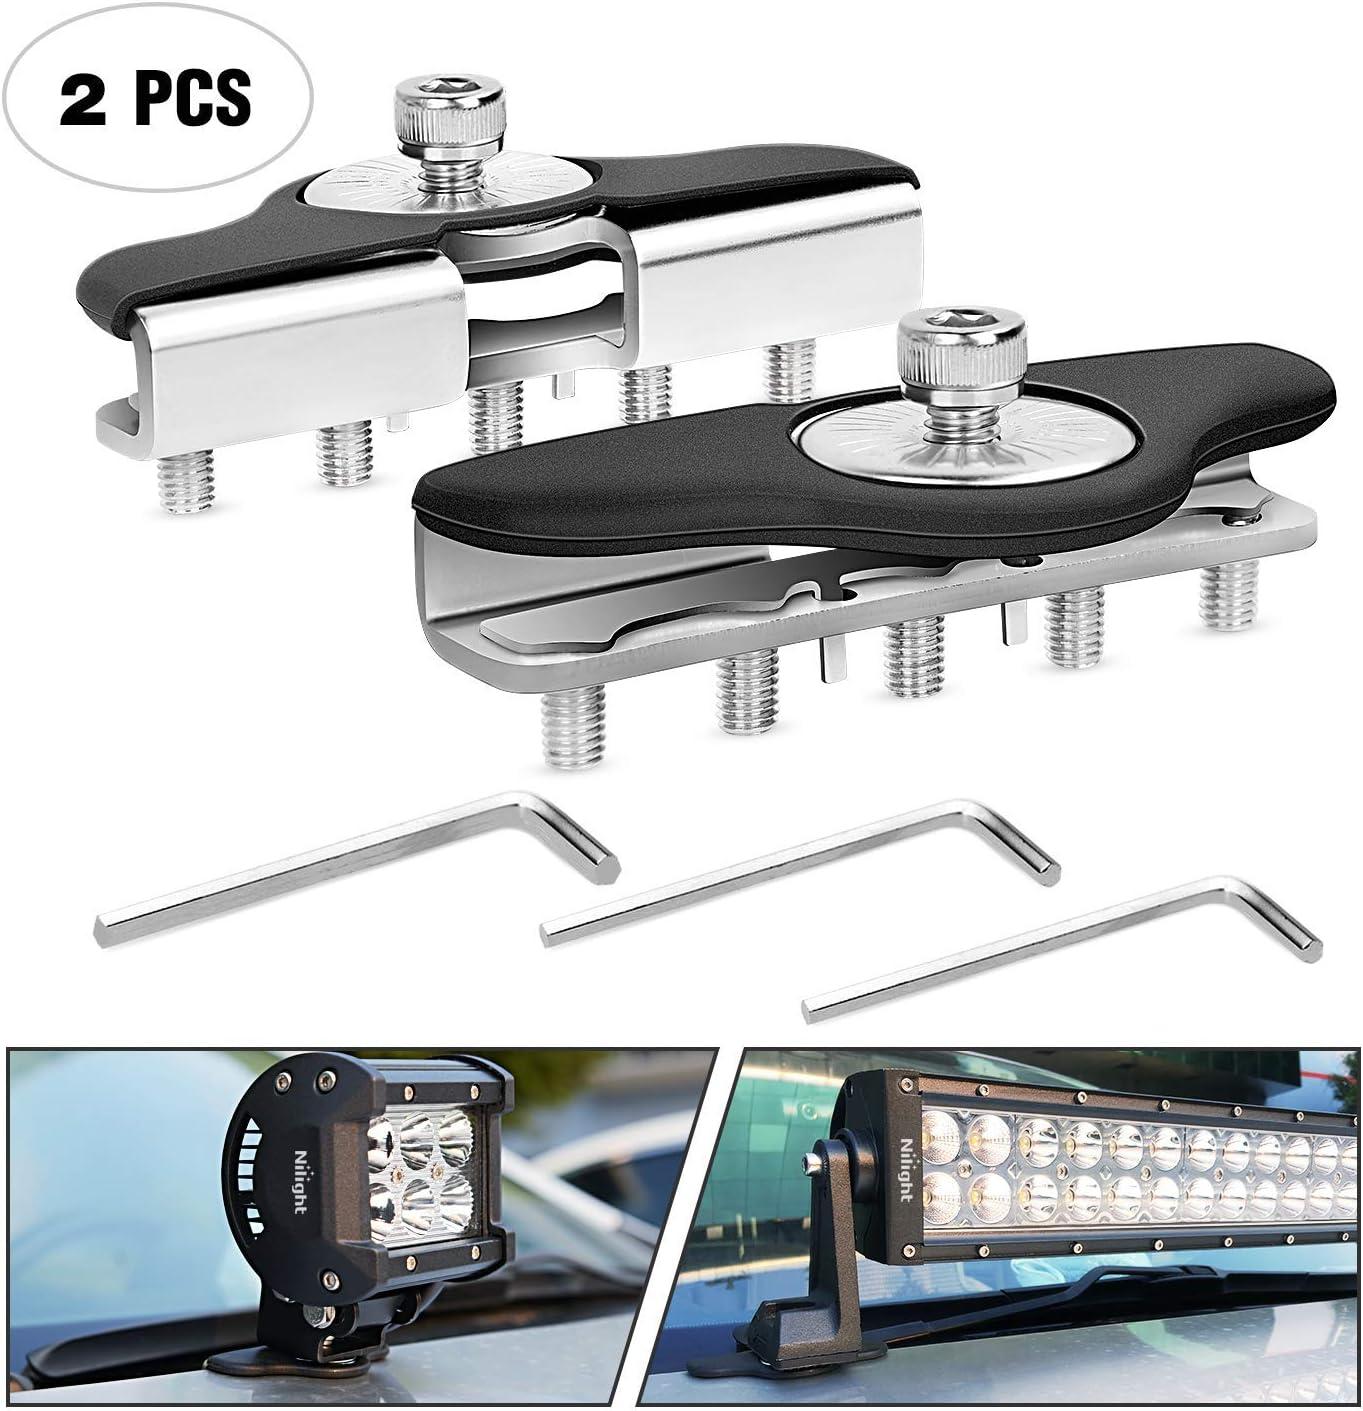 Auto Power Plus 2Pcs Universal Side Mounting Light Bar Mounting Brackets